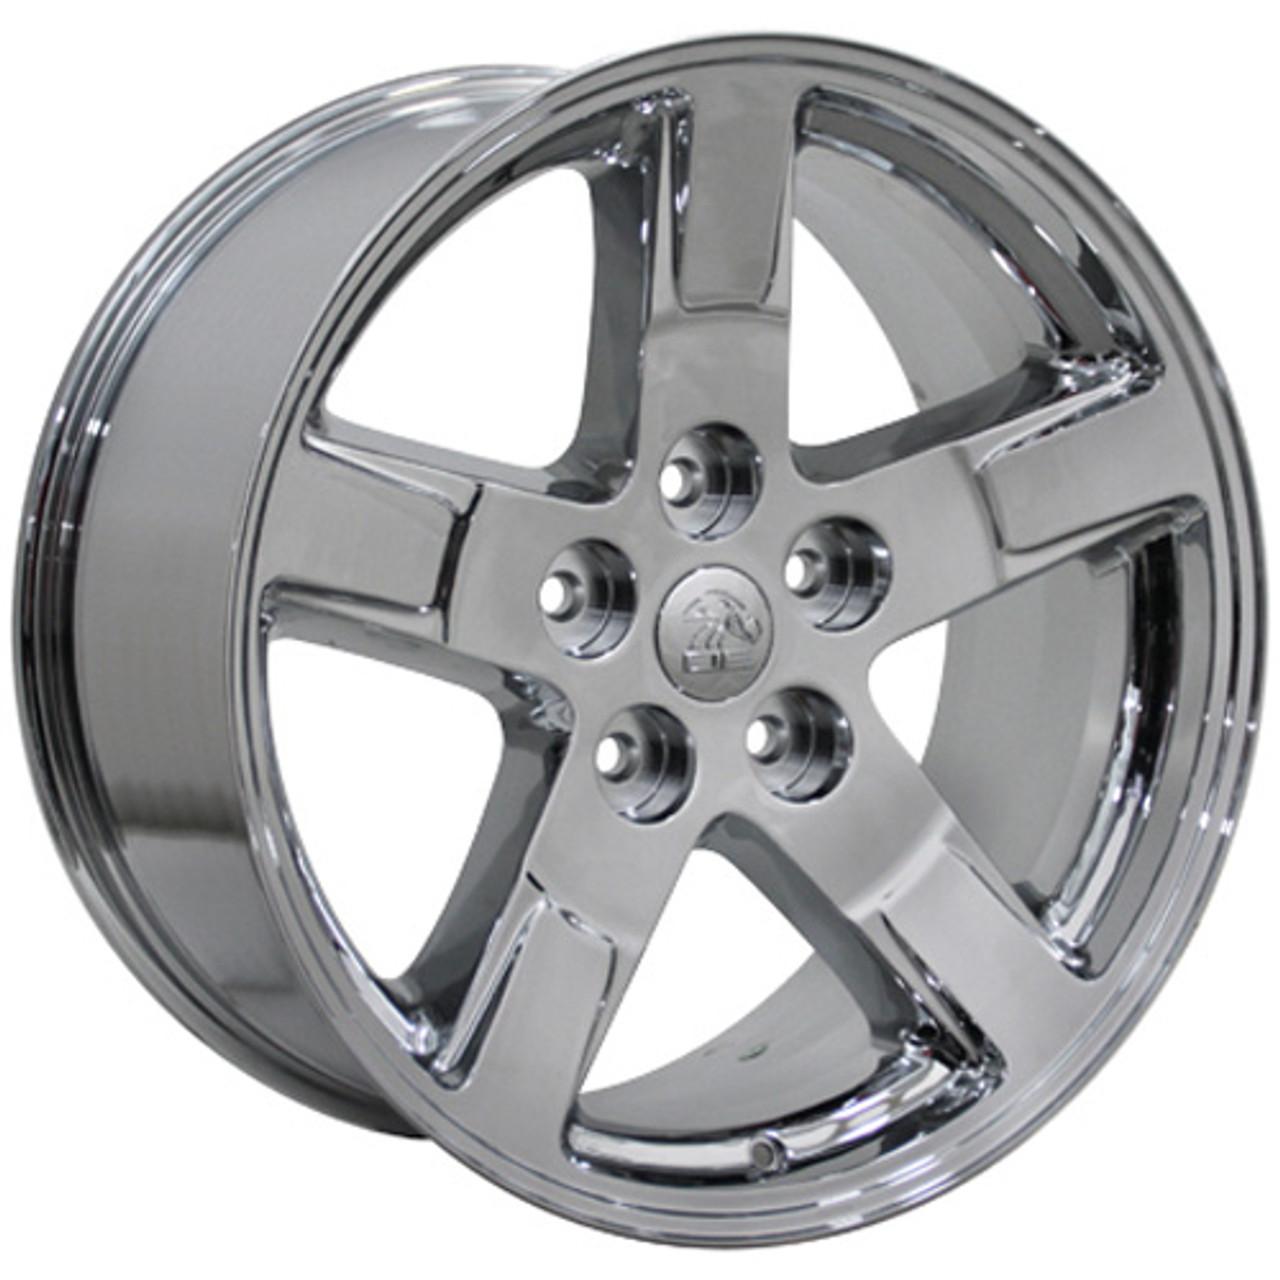 Dodge Durango Lug Pattern >> 20 Fits Dodge Ram 1500 Durango Wheels Chrome Set Of 4 20x9 Rims